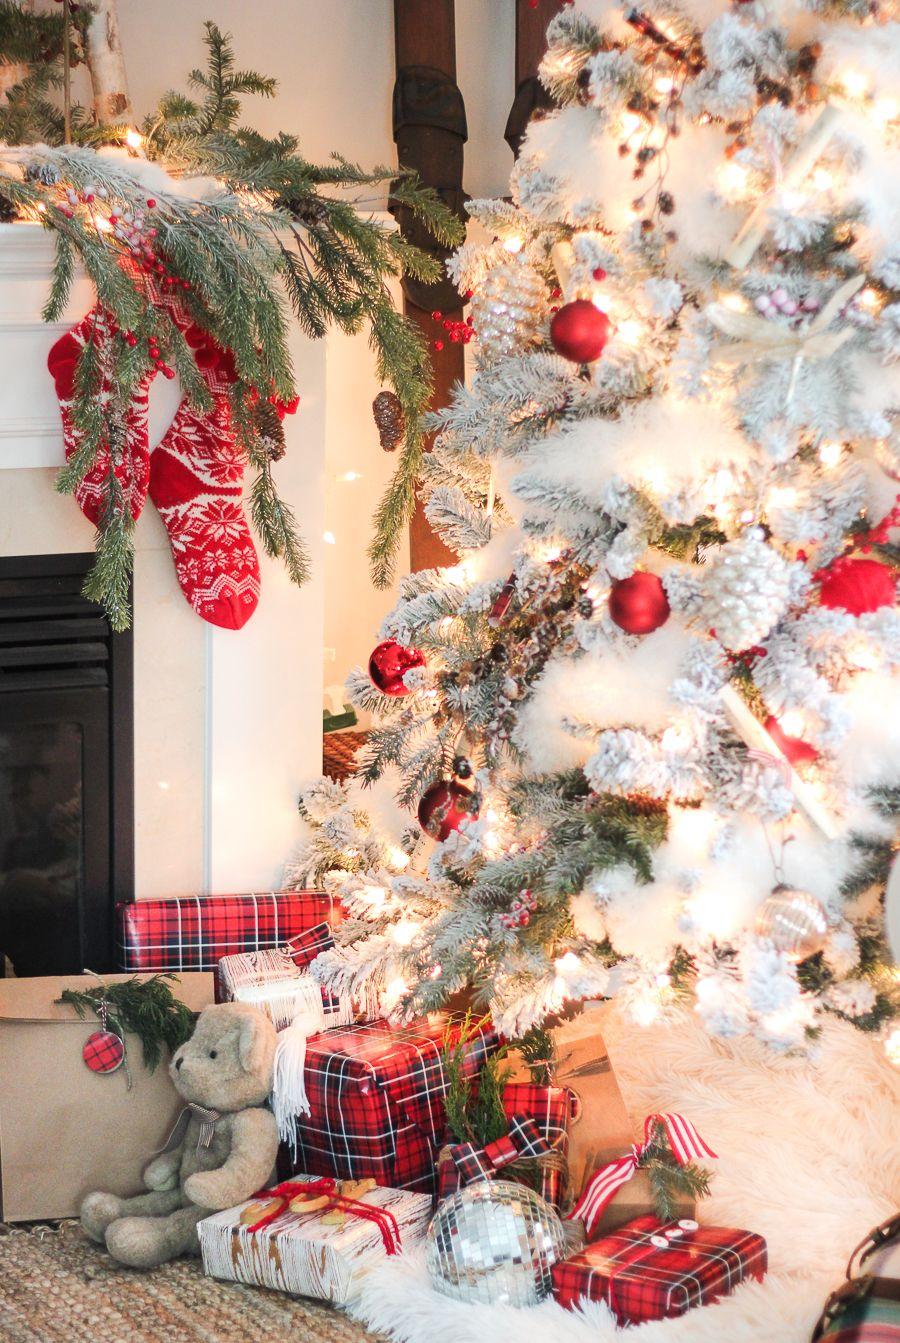 christmas decorating ideas & 20+ Best Christmas Decorating Ideas - Tips For Stylish Holiday ...